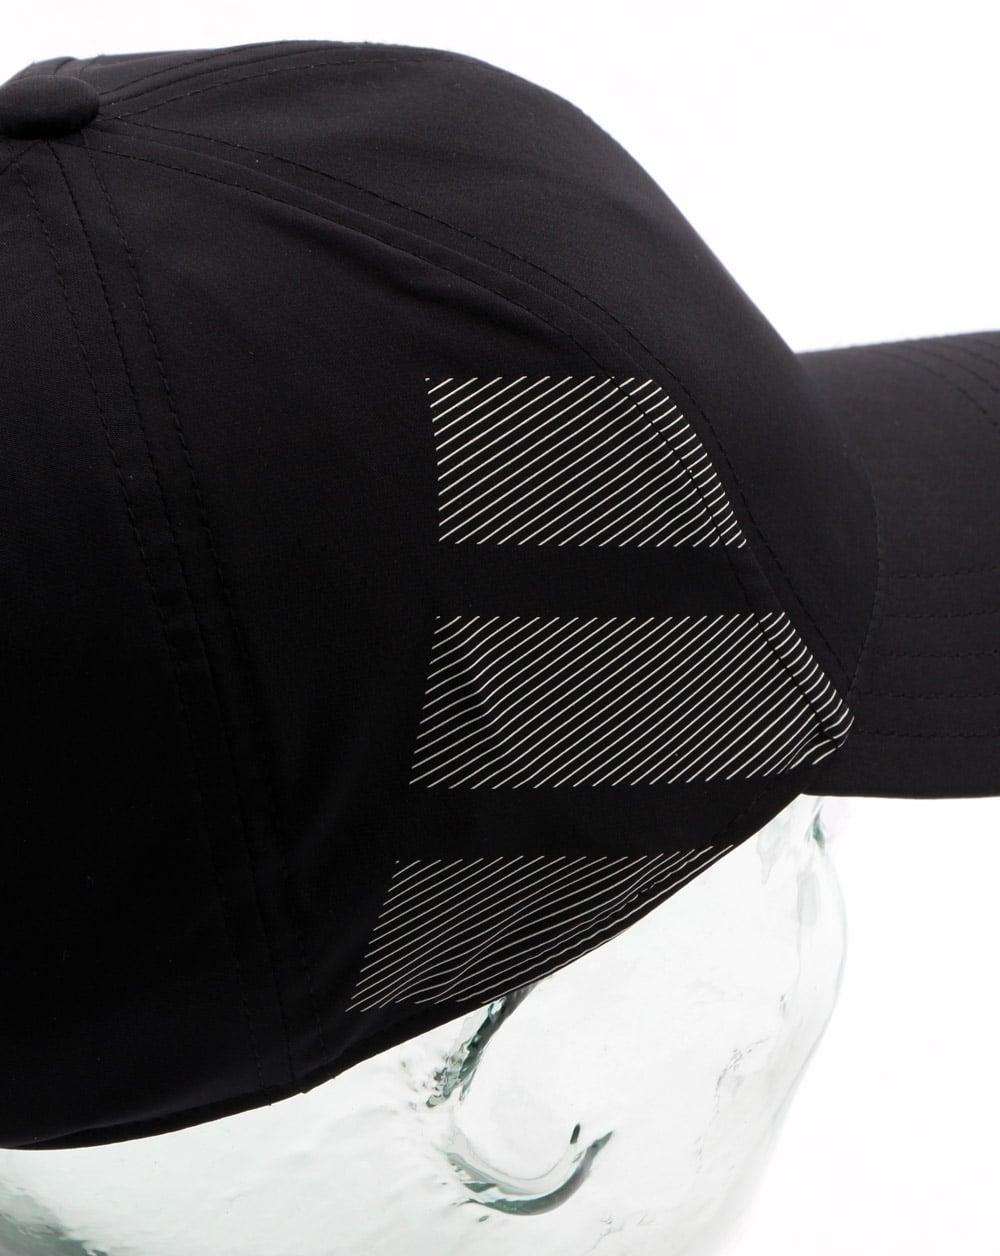 Adidas Originals Eqt Classic Cap Black white 7a9c08ada98